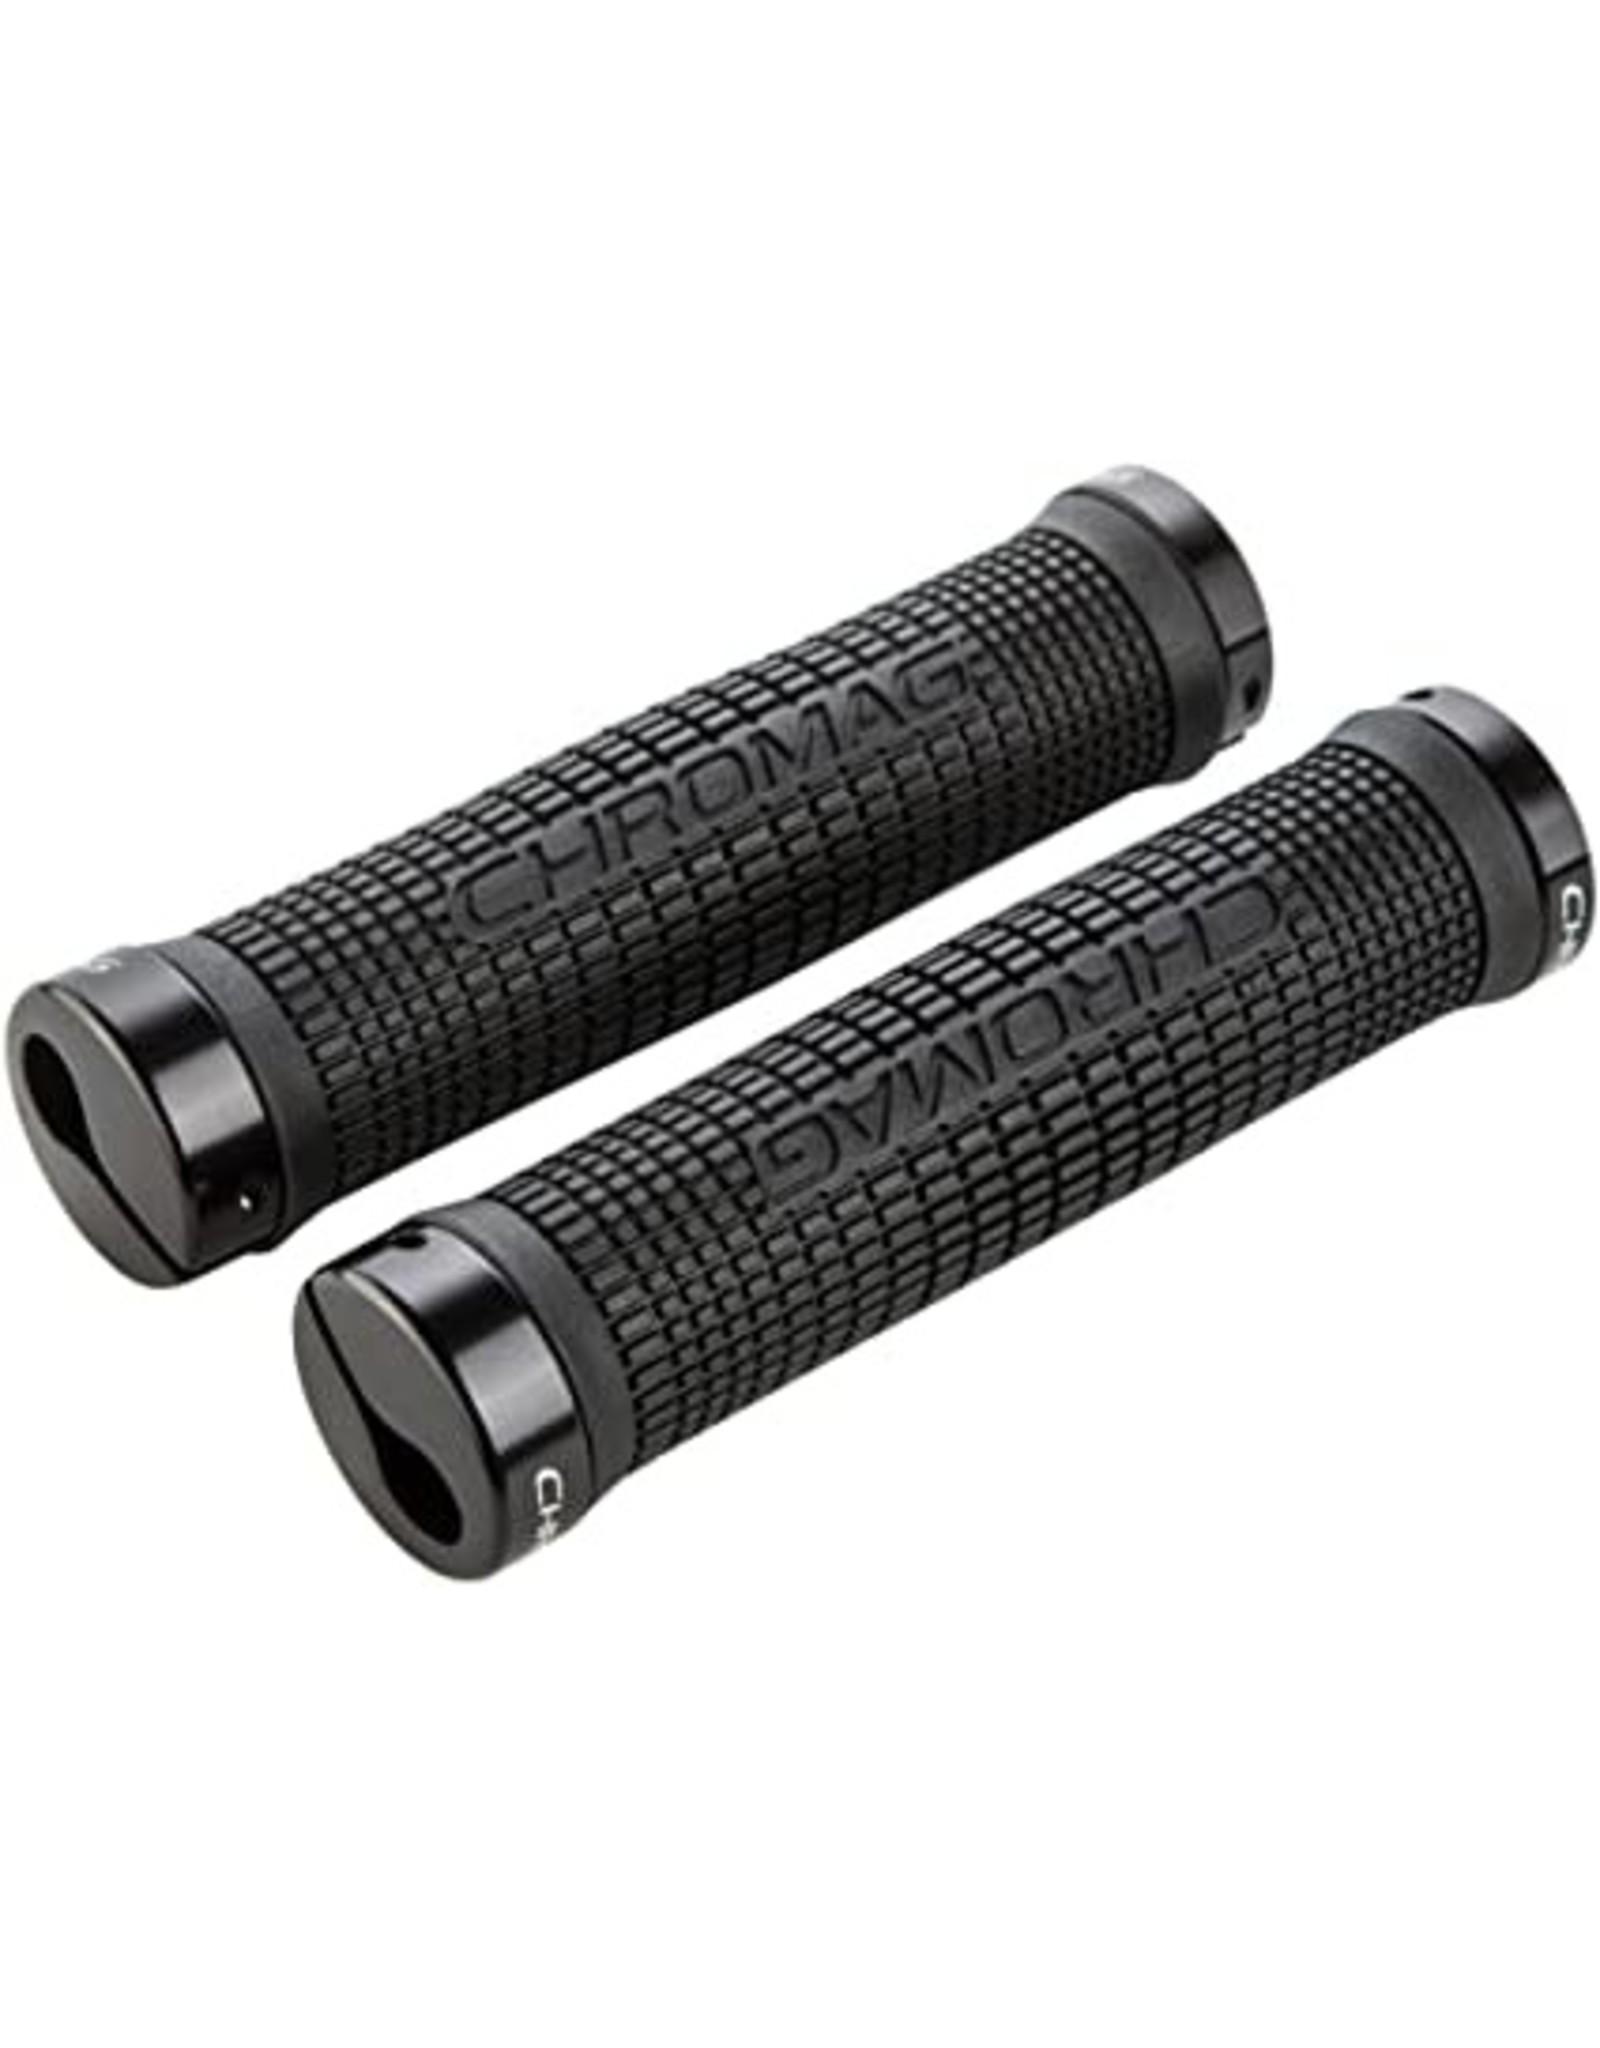 Chromag Grips Squarewave black/black